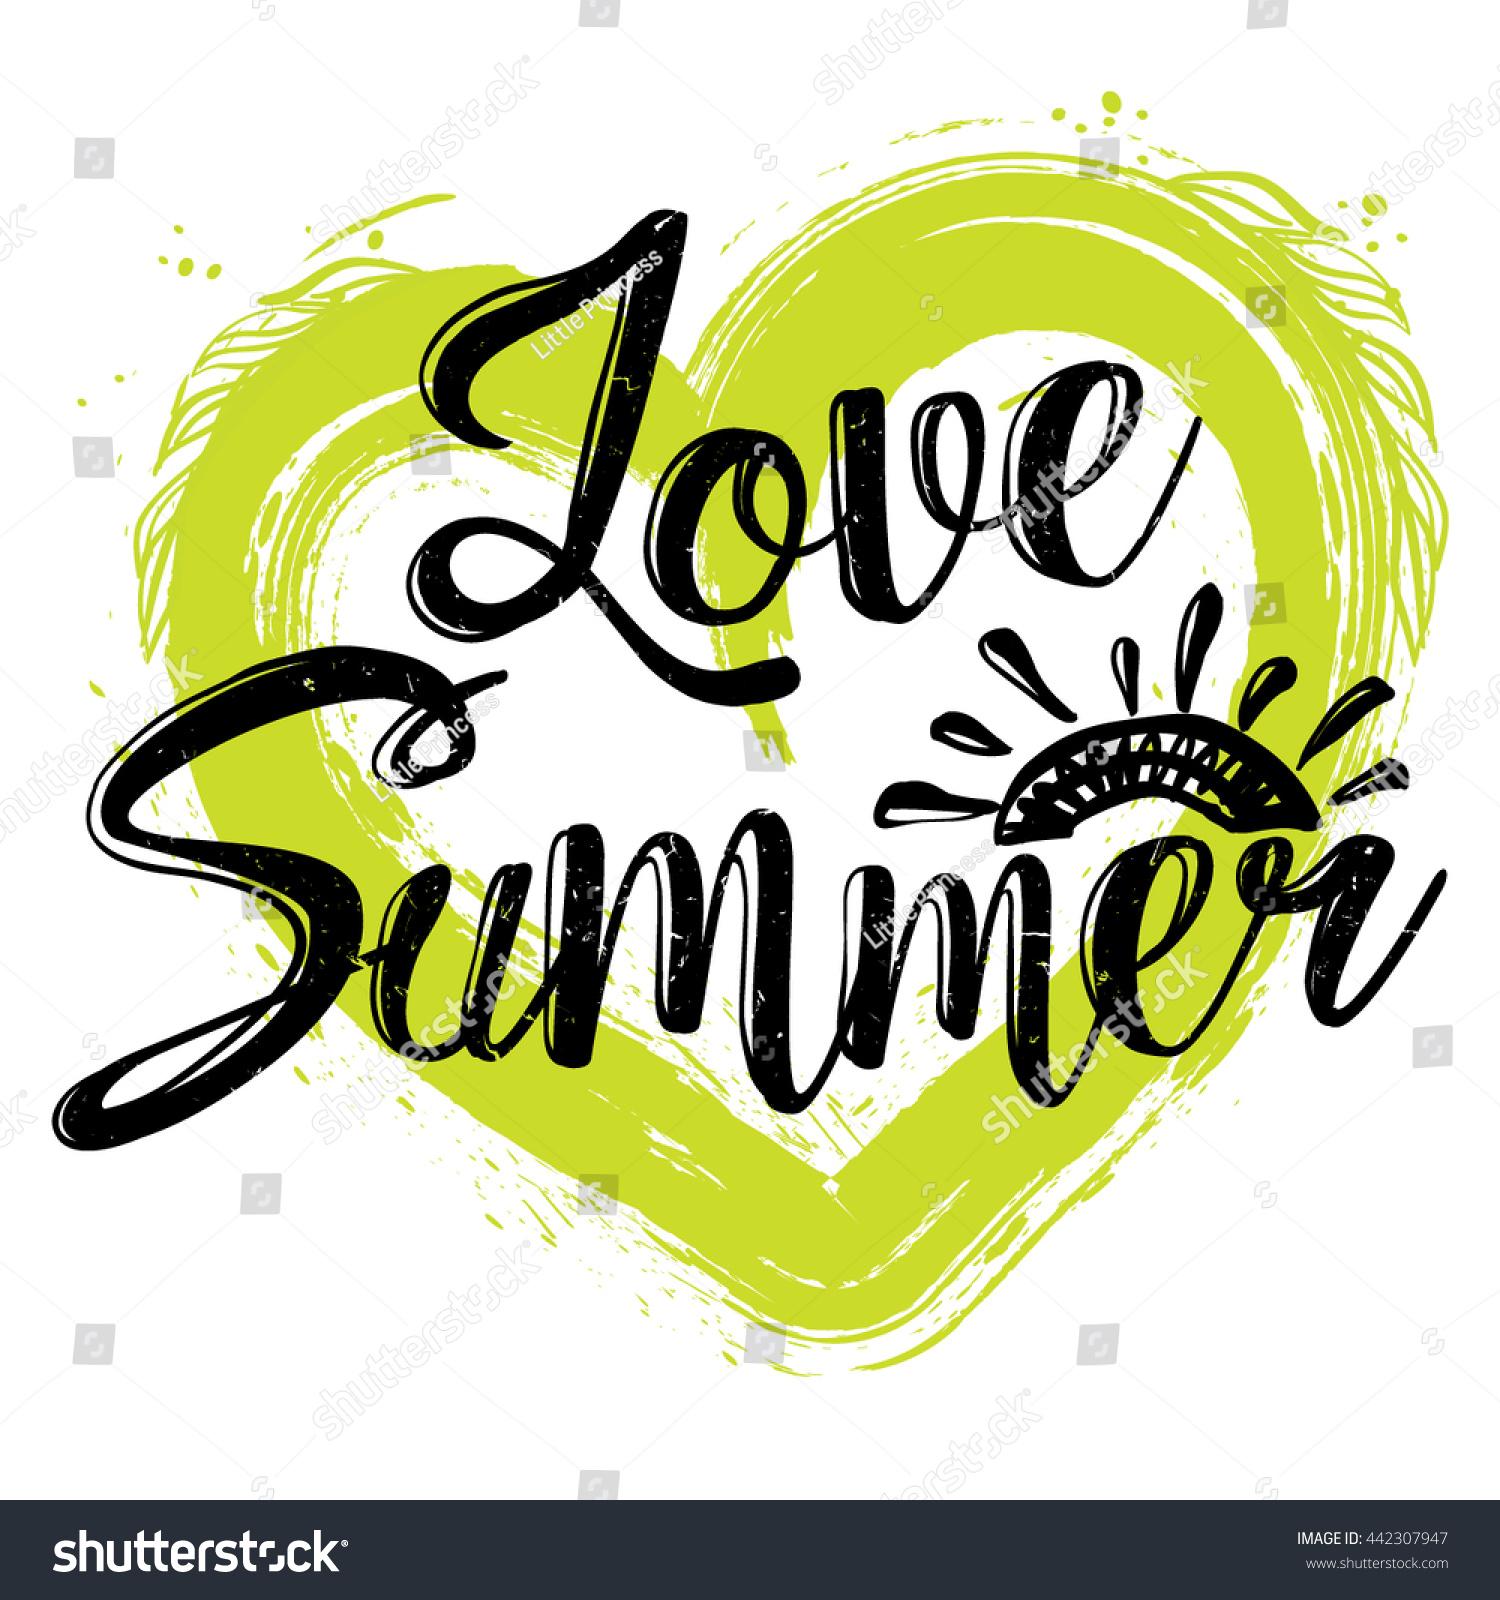 Shirt design wallpaper - T Shirt Design For Girls Abstract Illustration With Creative Design Love Summer Background